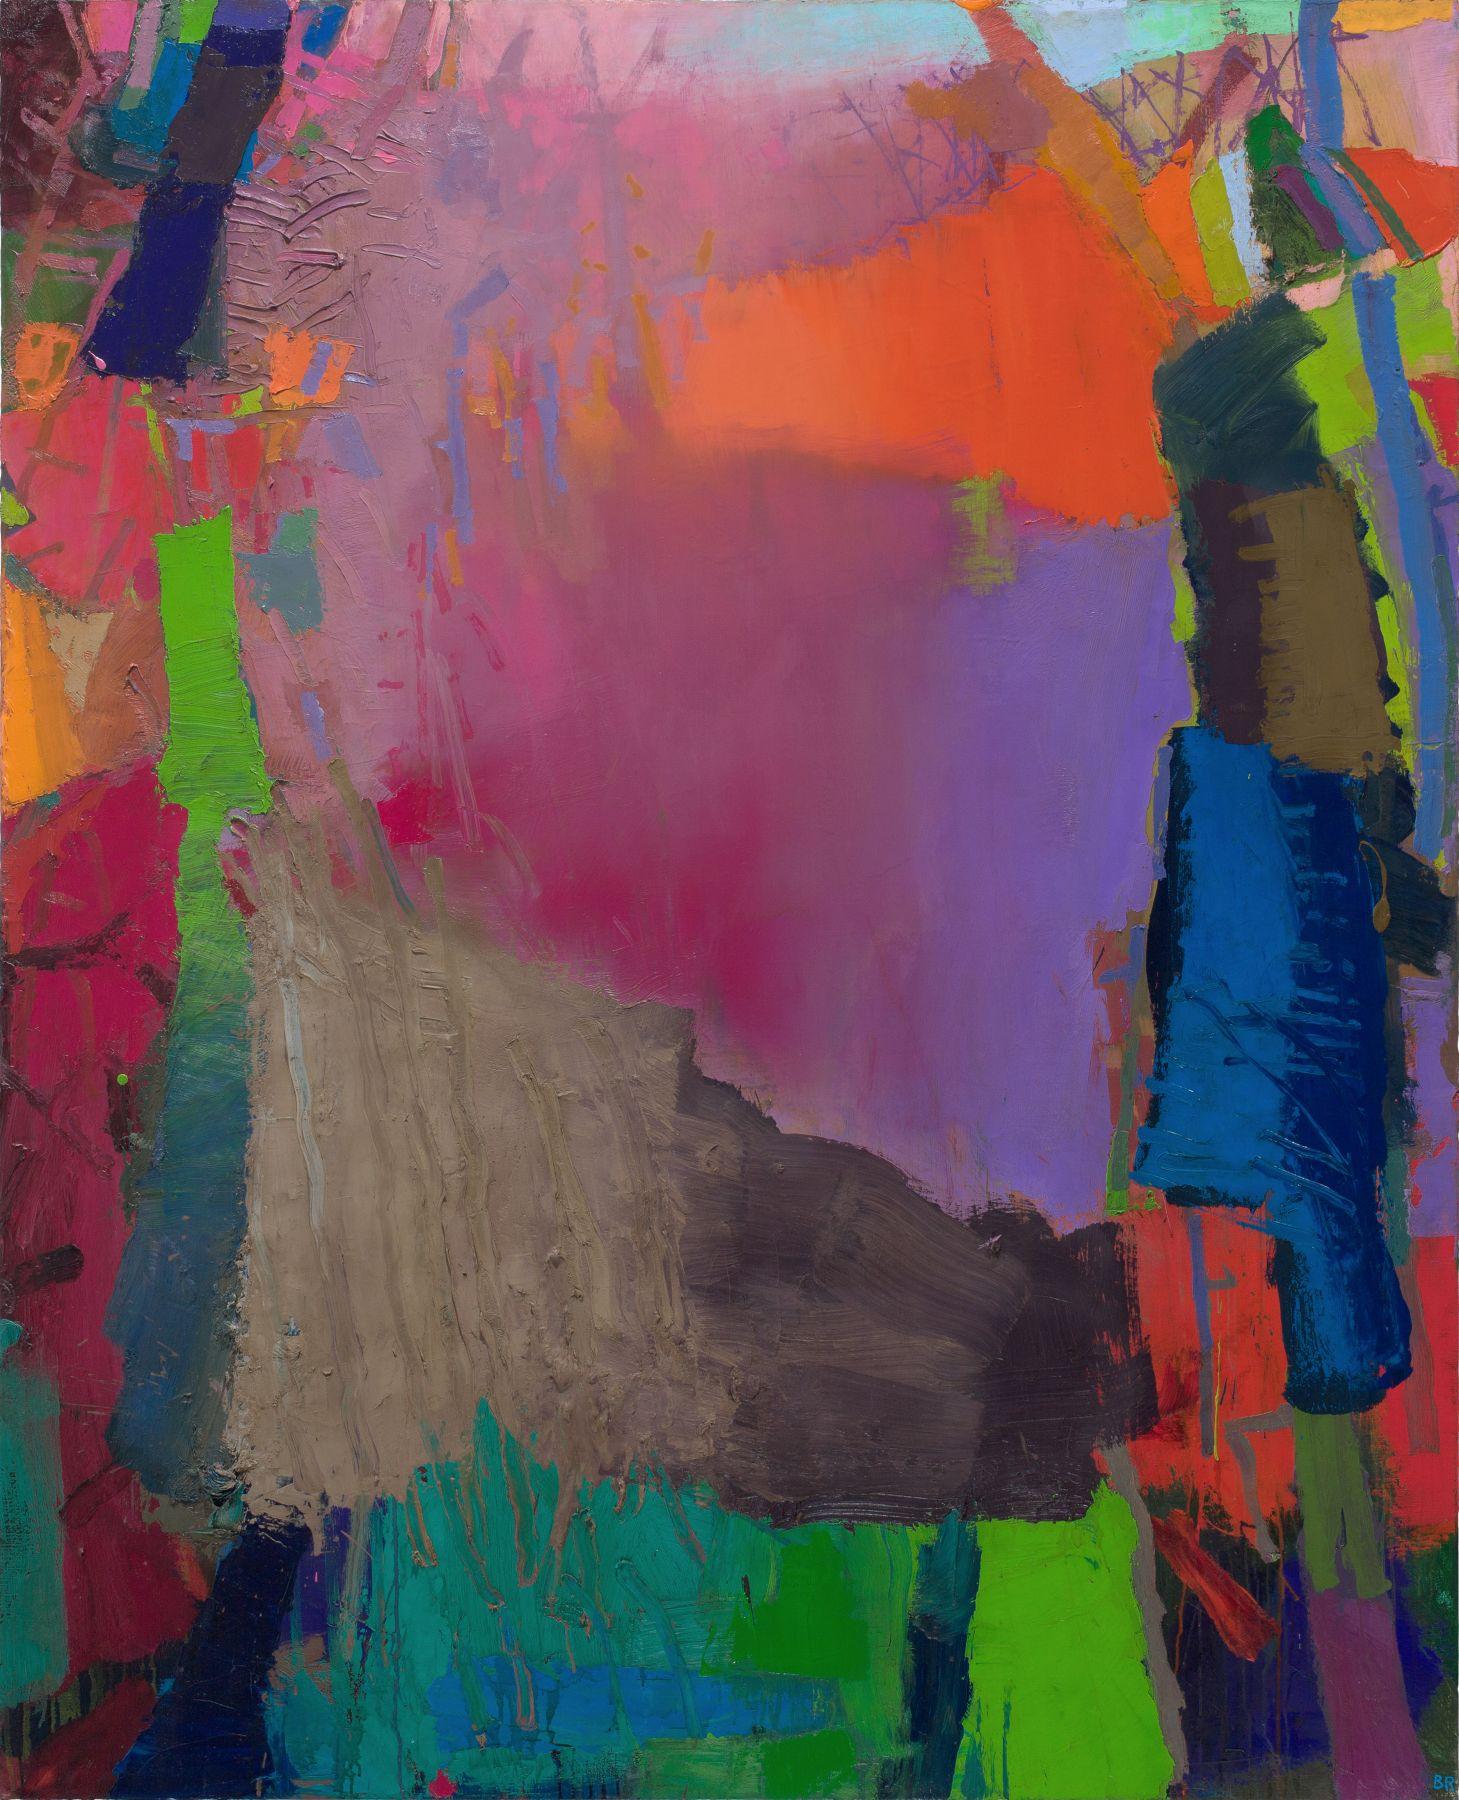 Brian Rutenberg, Hemlock (SOLD), 2013, oil on linen, 68 x 55 inches